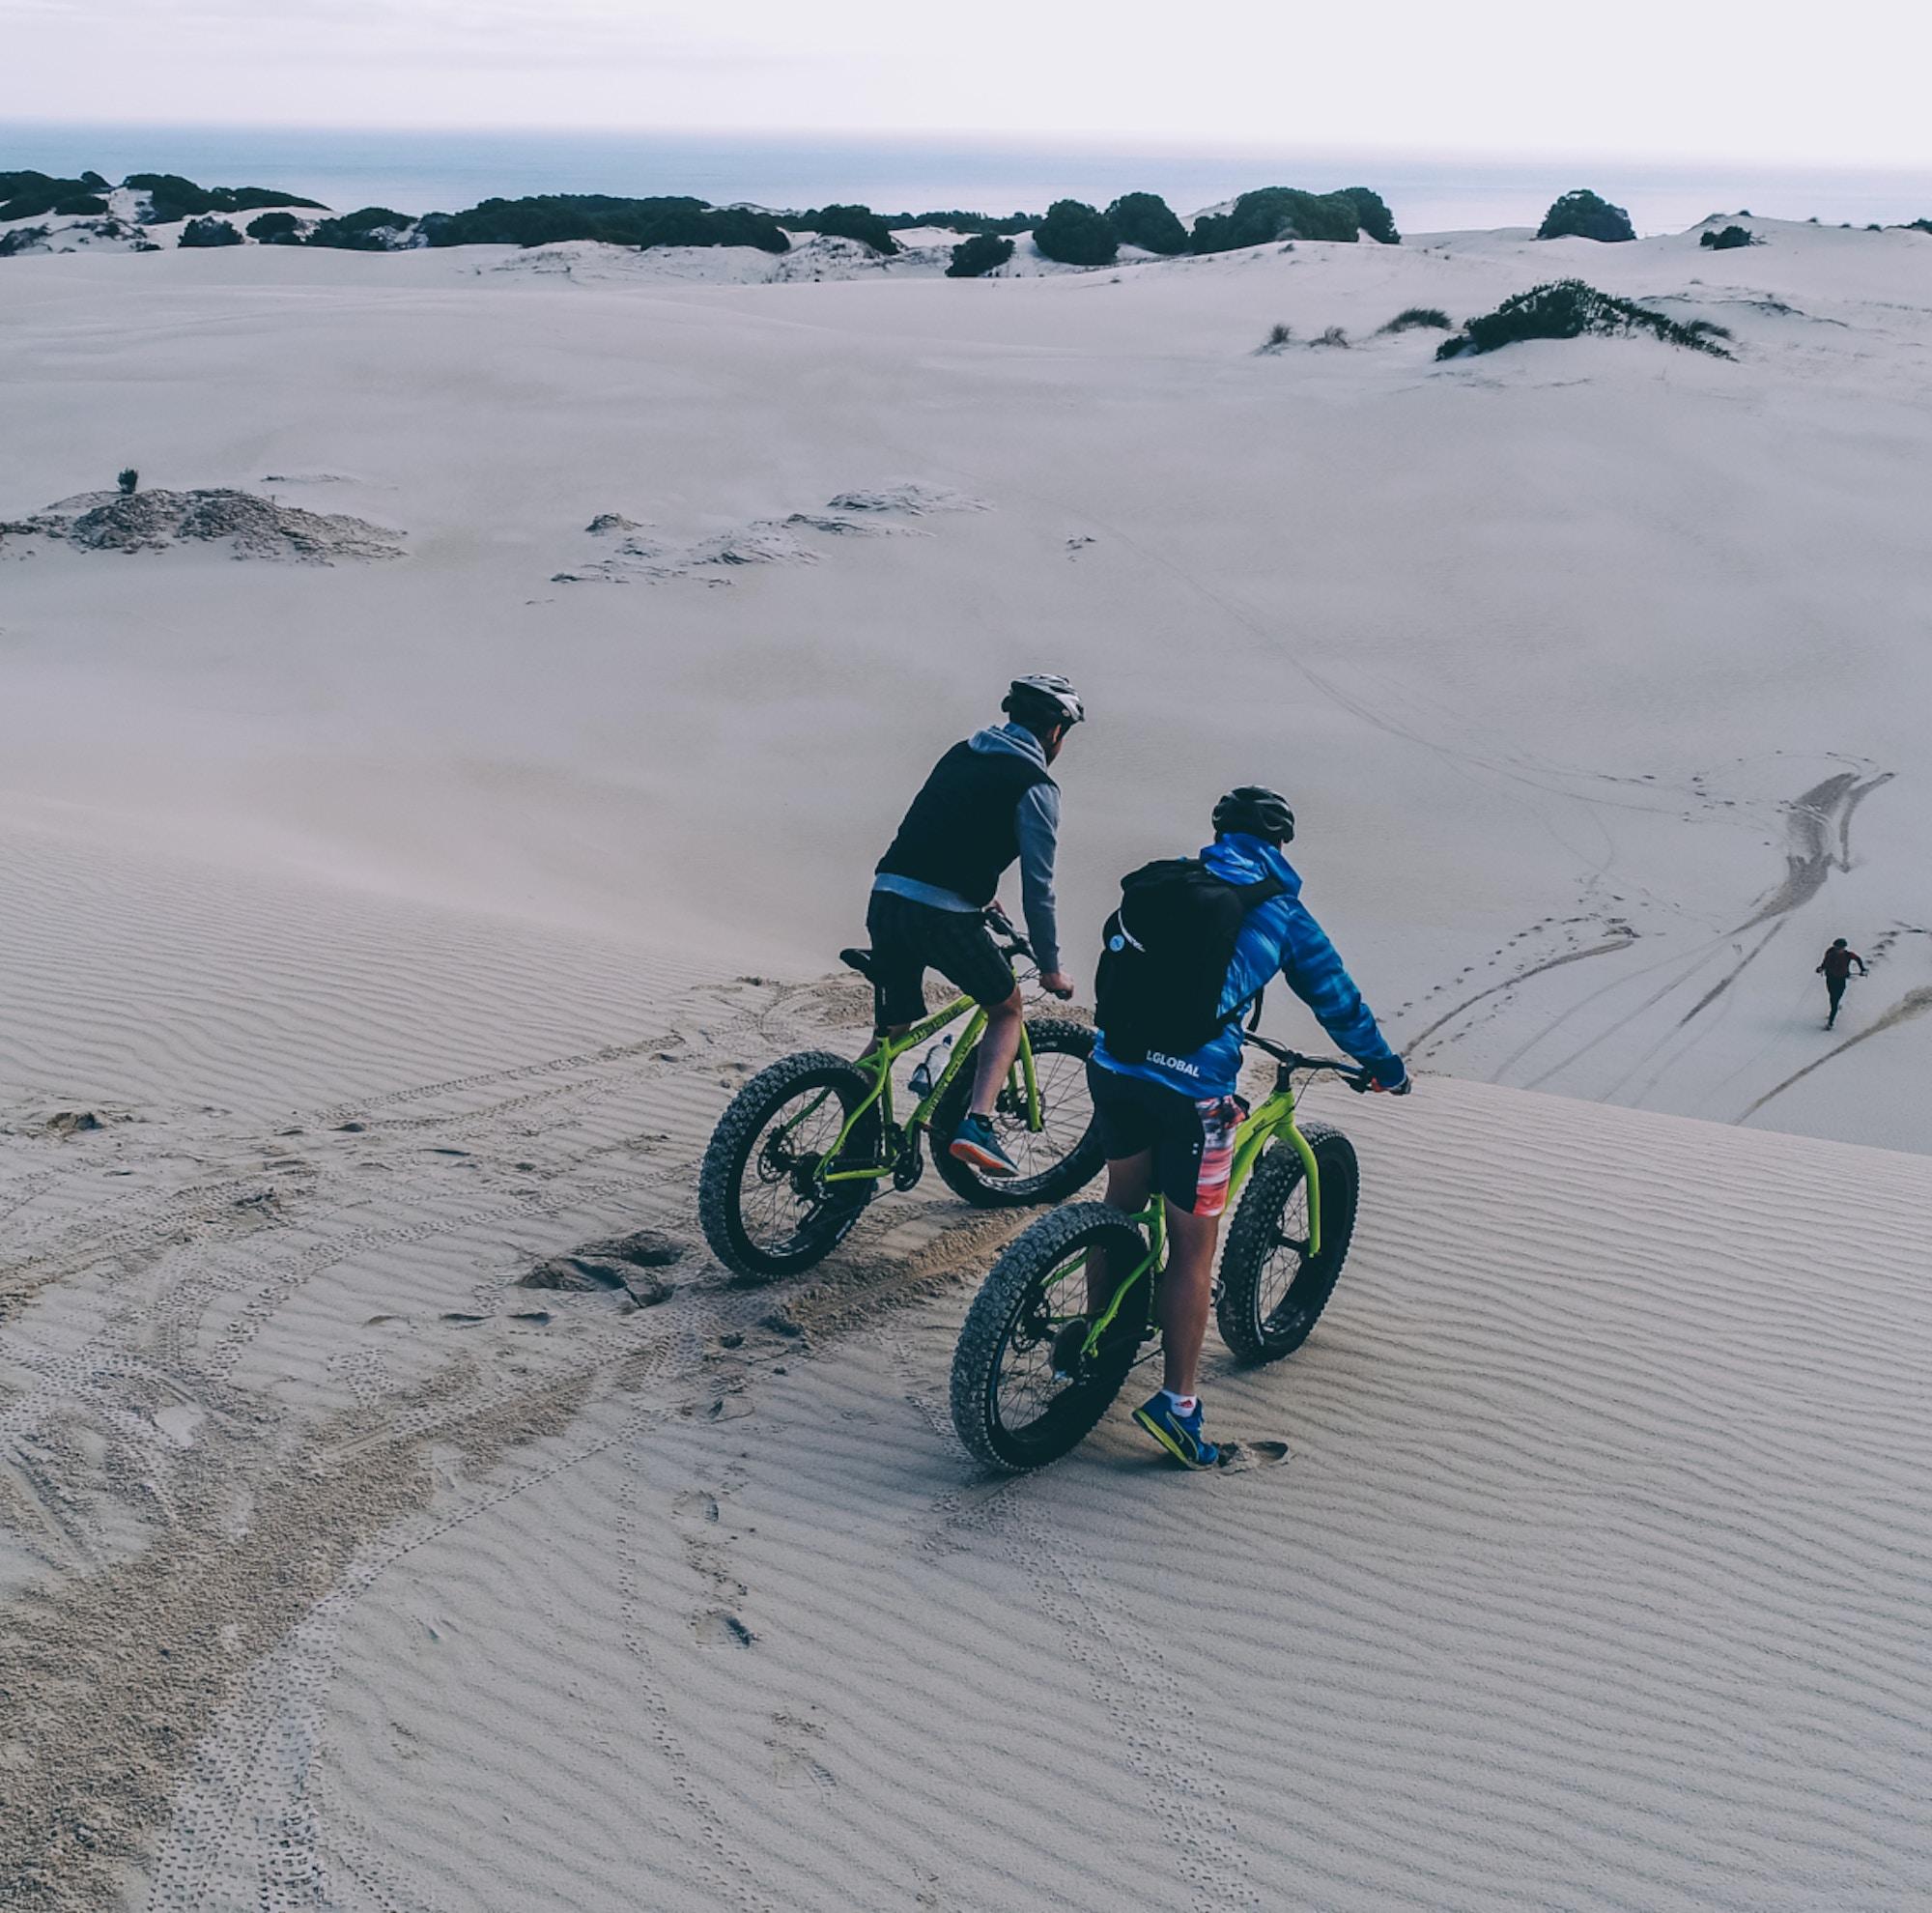 Fat Biking in the dunes of Gansbaai Image Shawn Ugulu